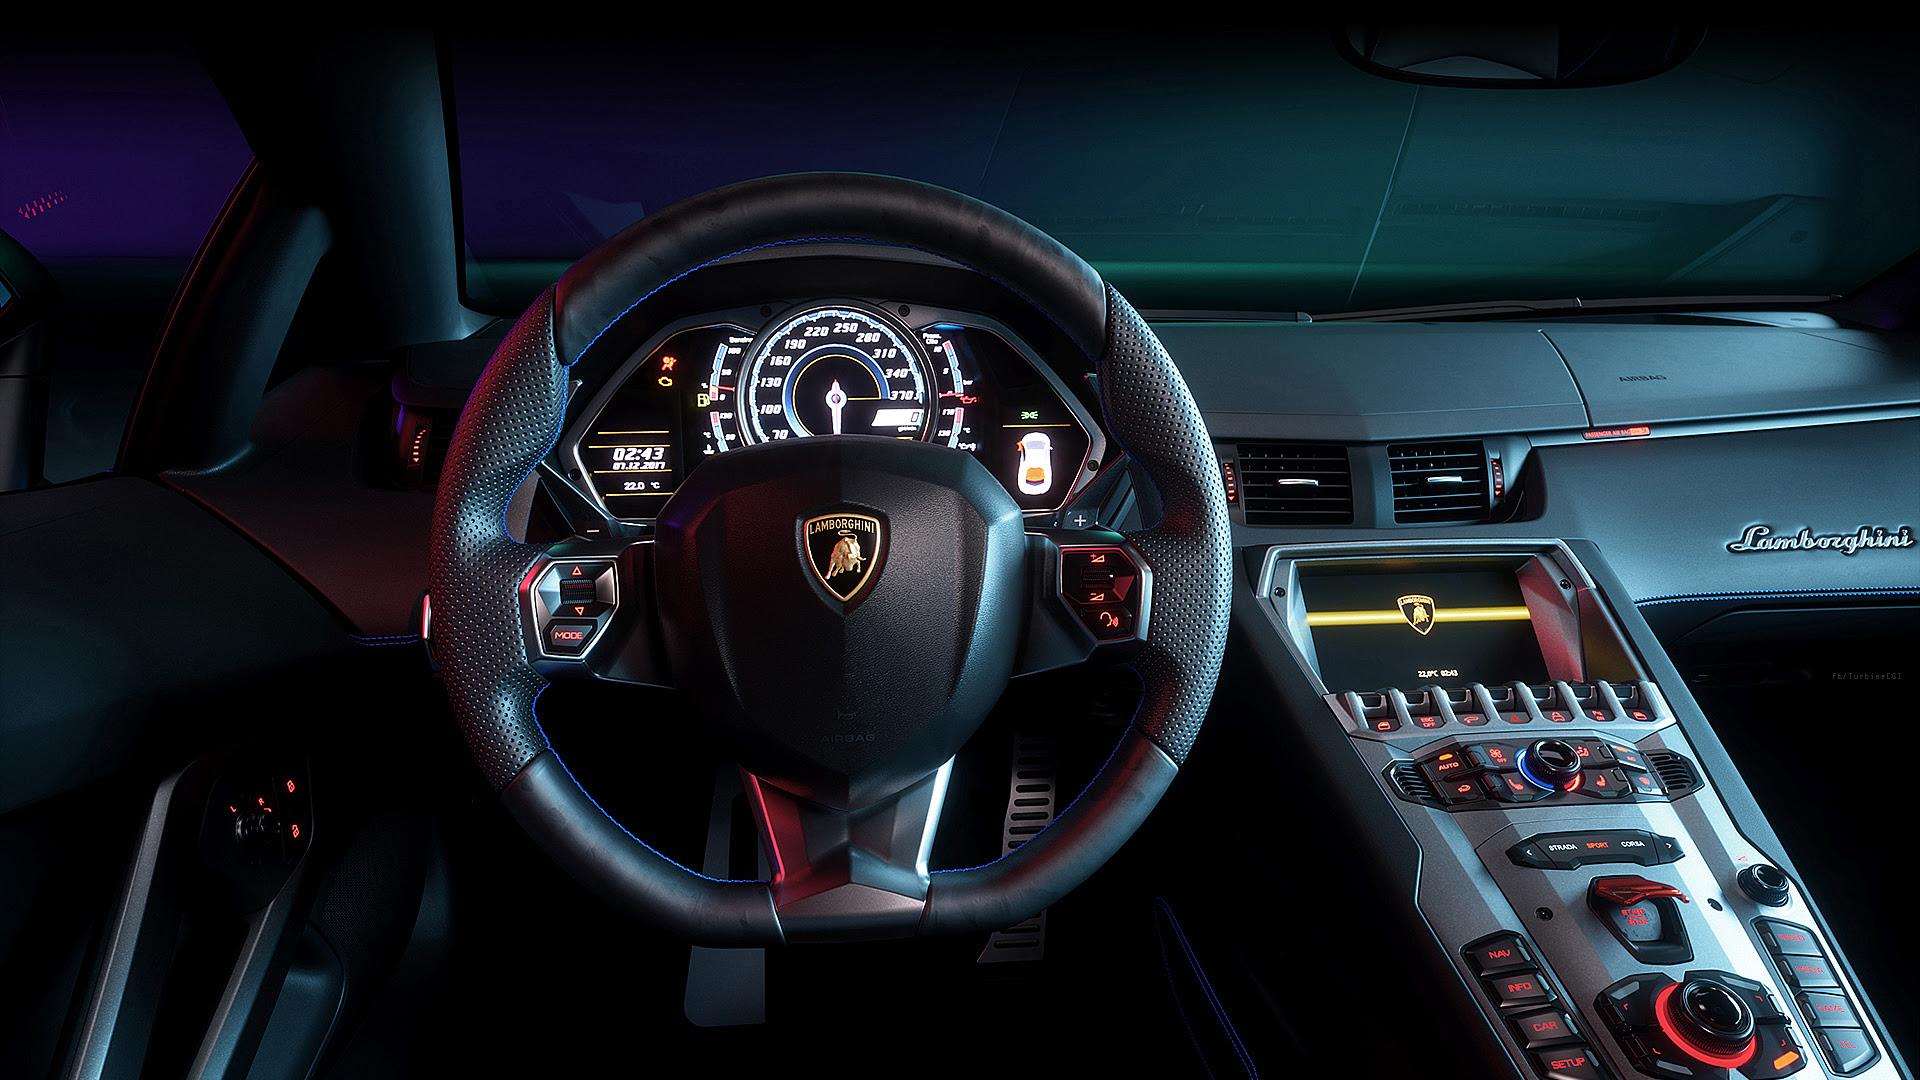 Lamborghini Aventador Interior Cgi Wallpapers Wallpapers Hd